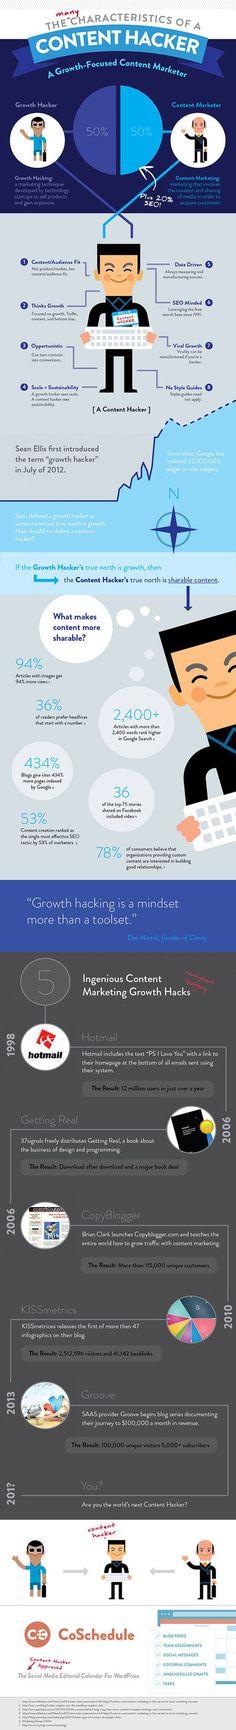 10 Content Marketing Growth Hacks [with Infographic] - Unbounce | #TheMarketingTechAlert